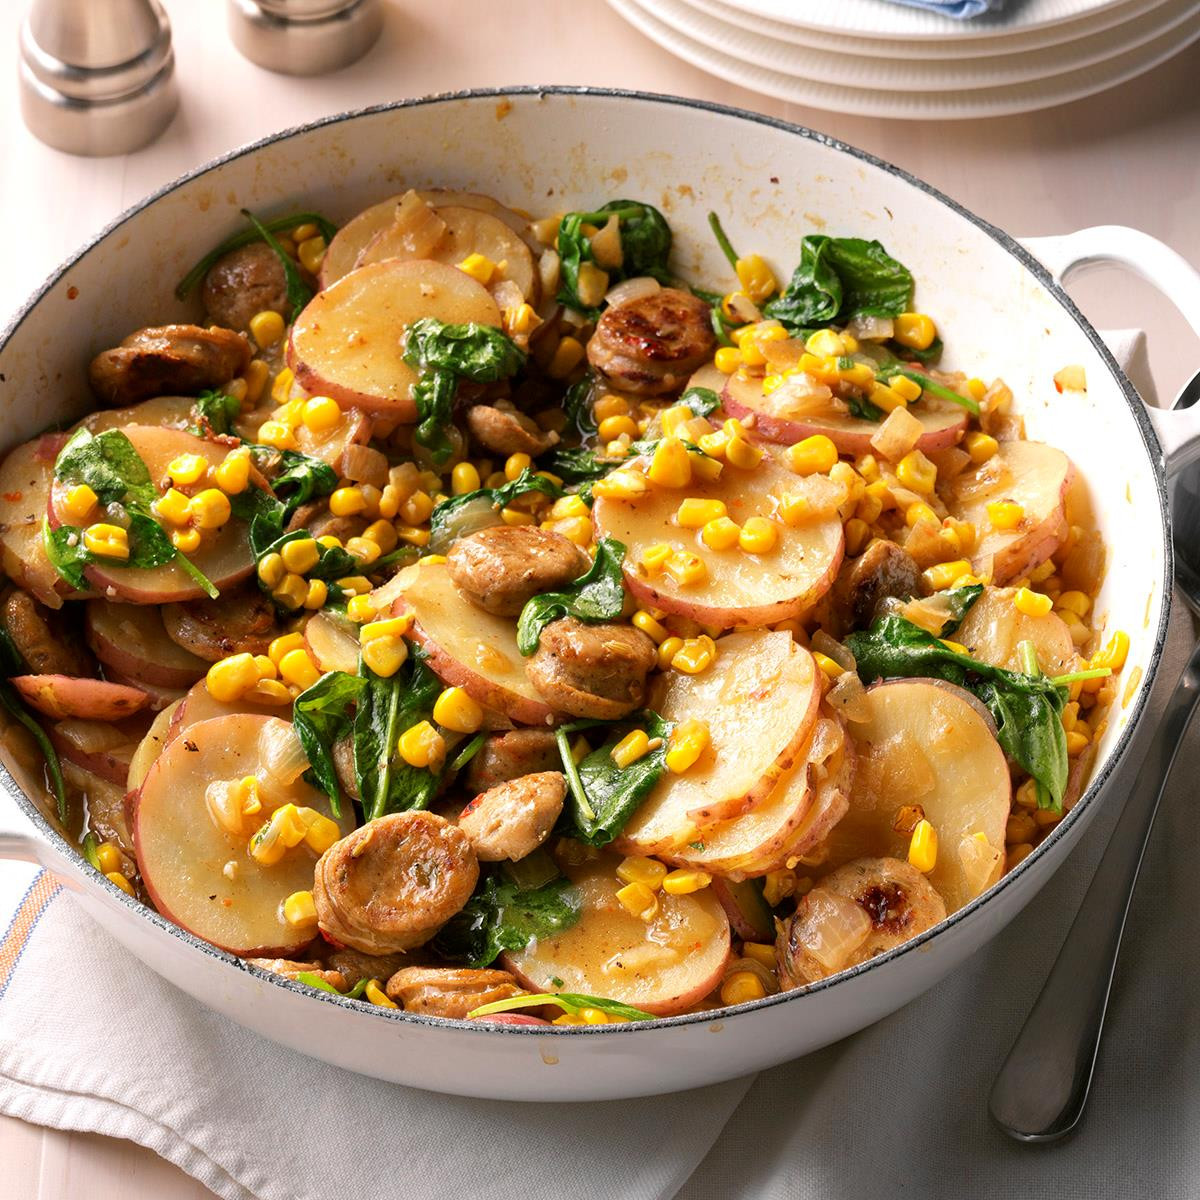 Skillet Dinners Recipes  Sausage & Ve able Skillet Dinner Recipe